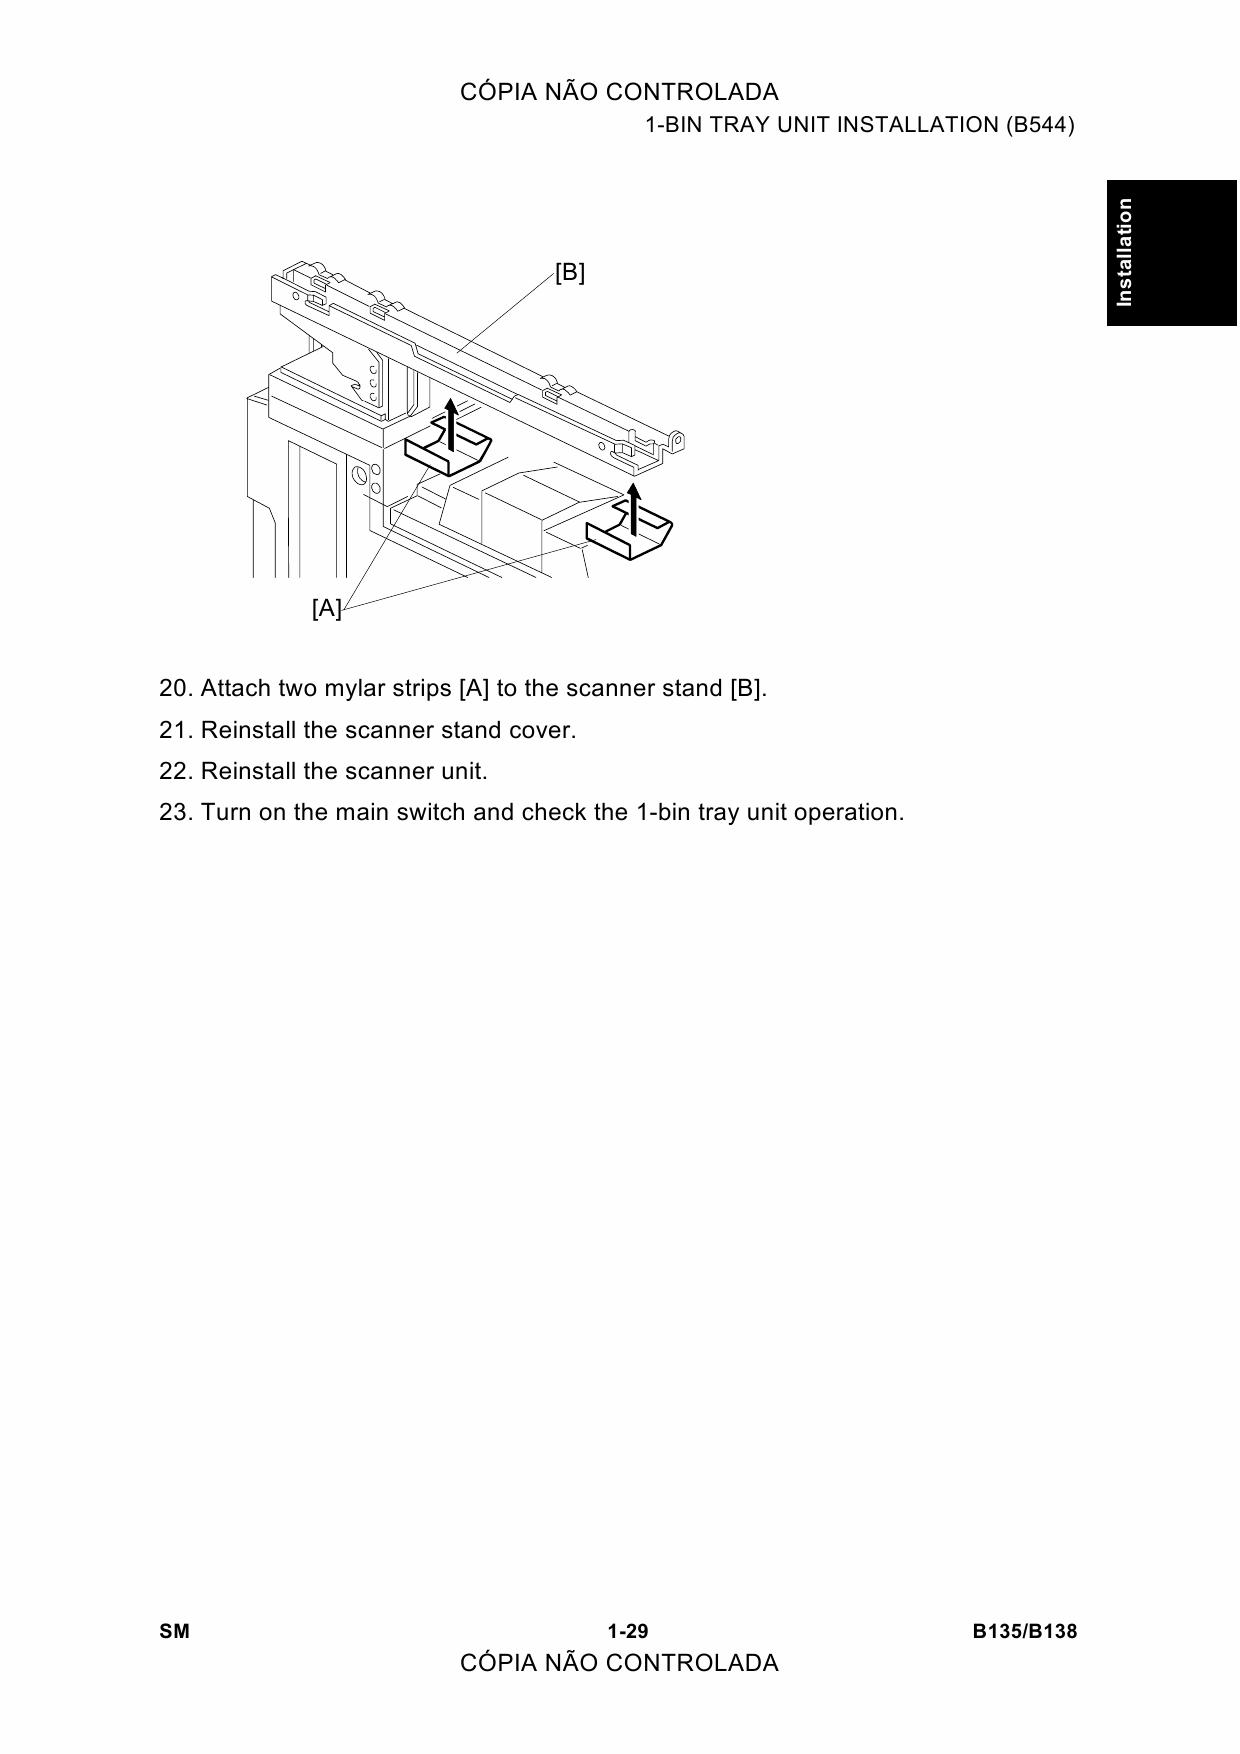 Ricoh Aficio 2045e User Manual Garage Door Opener Circuit Design Tom39s Maker Site Array 2035e B135 B182 B138 B183 Service Rh Qmanual Com